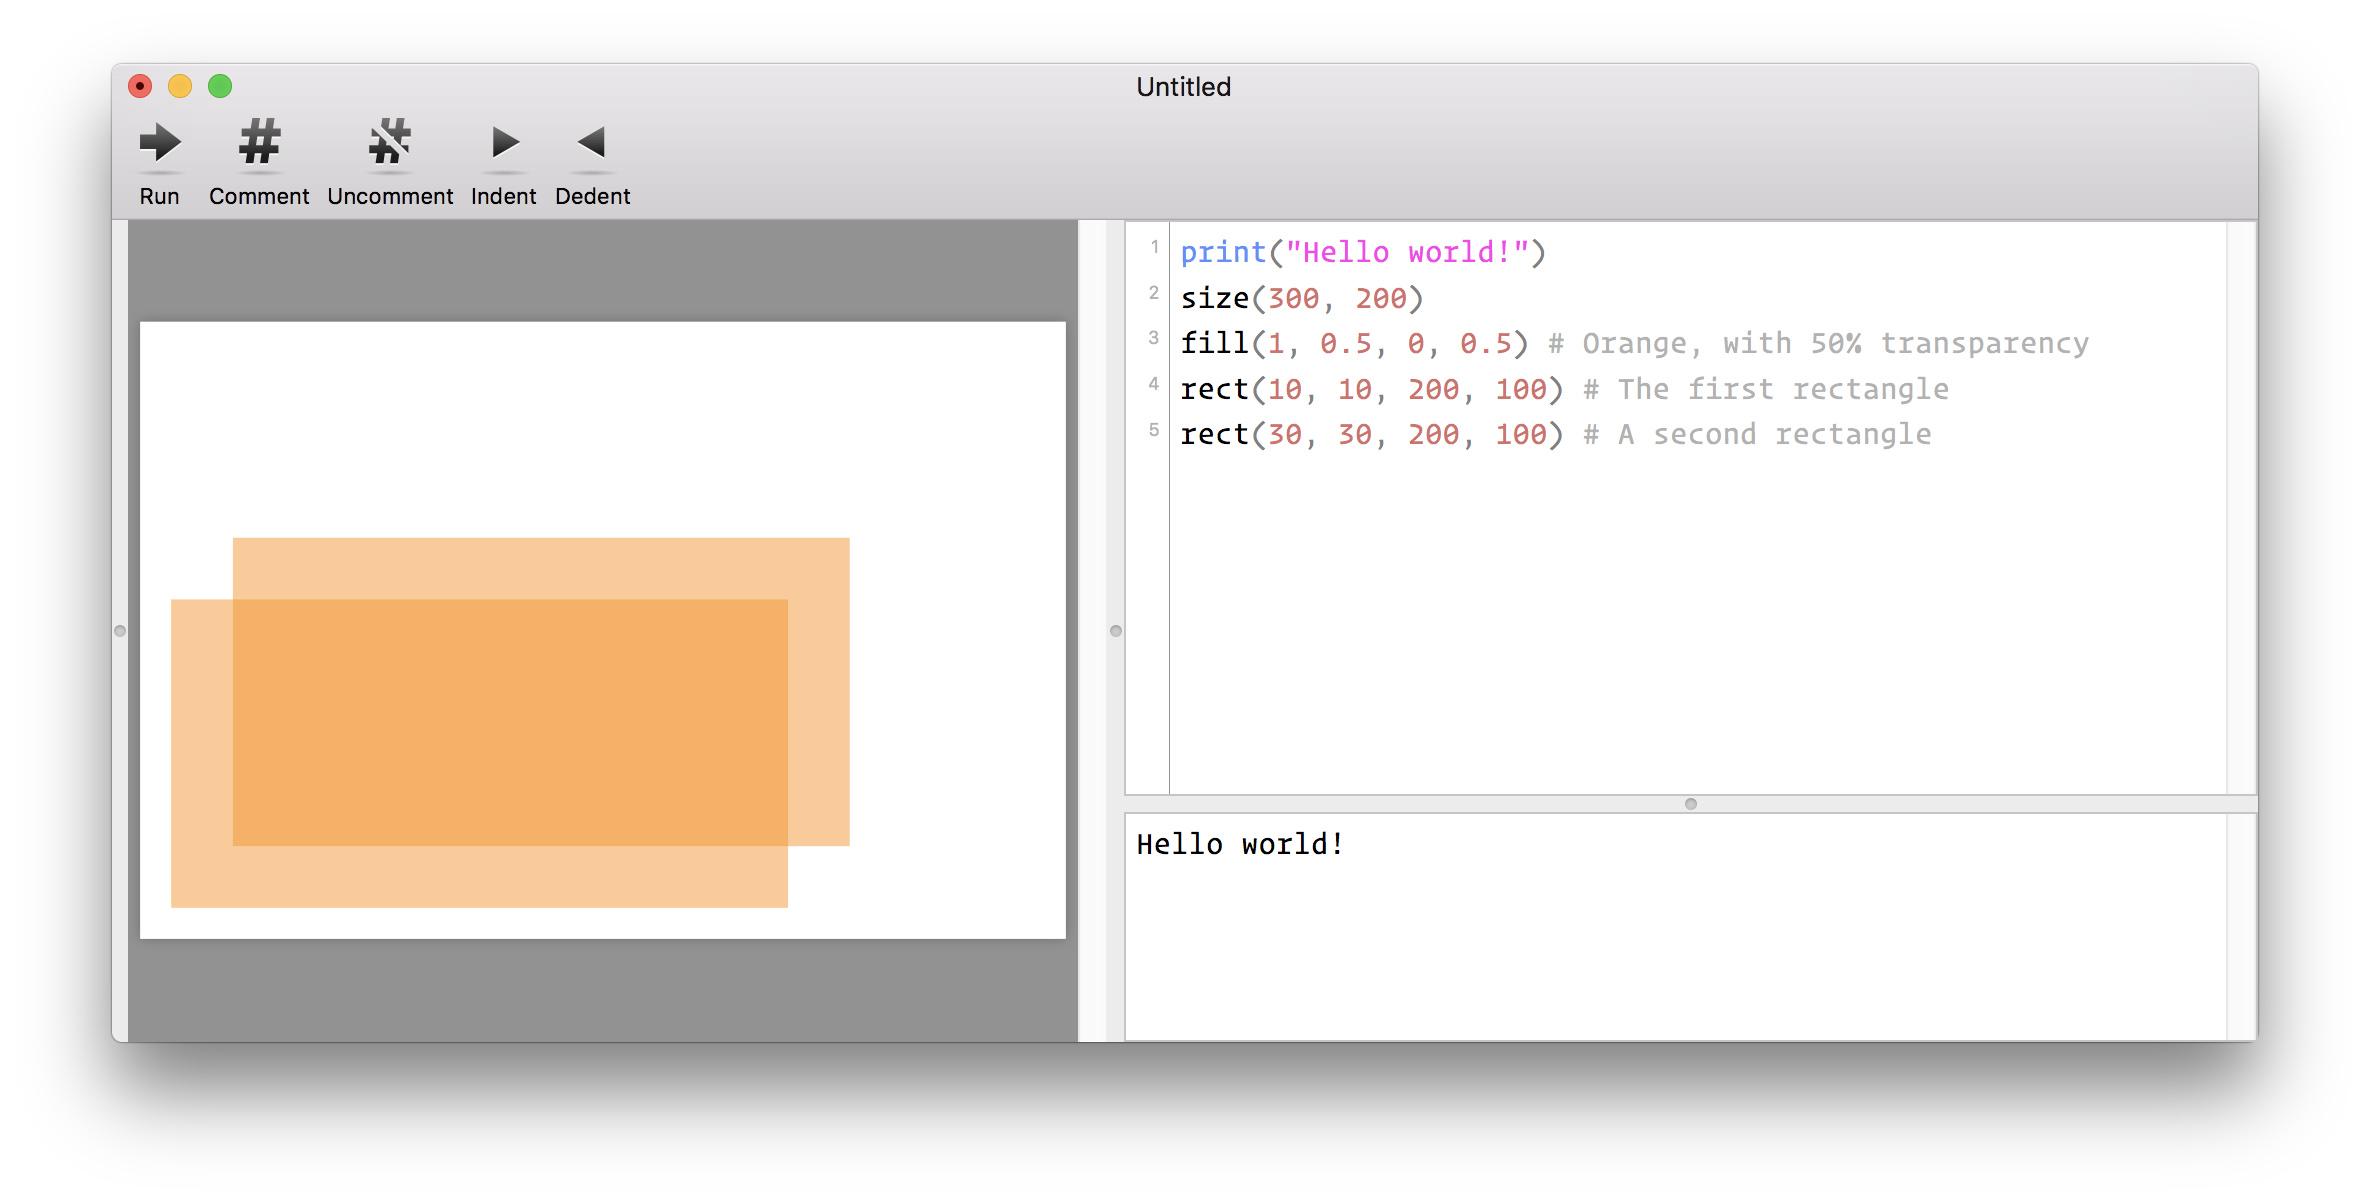 python_HelloWorld-RectColor-2.jpg